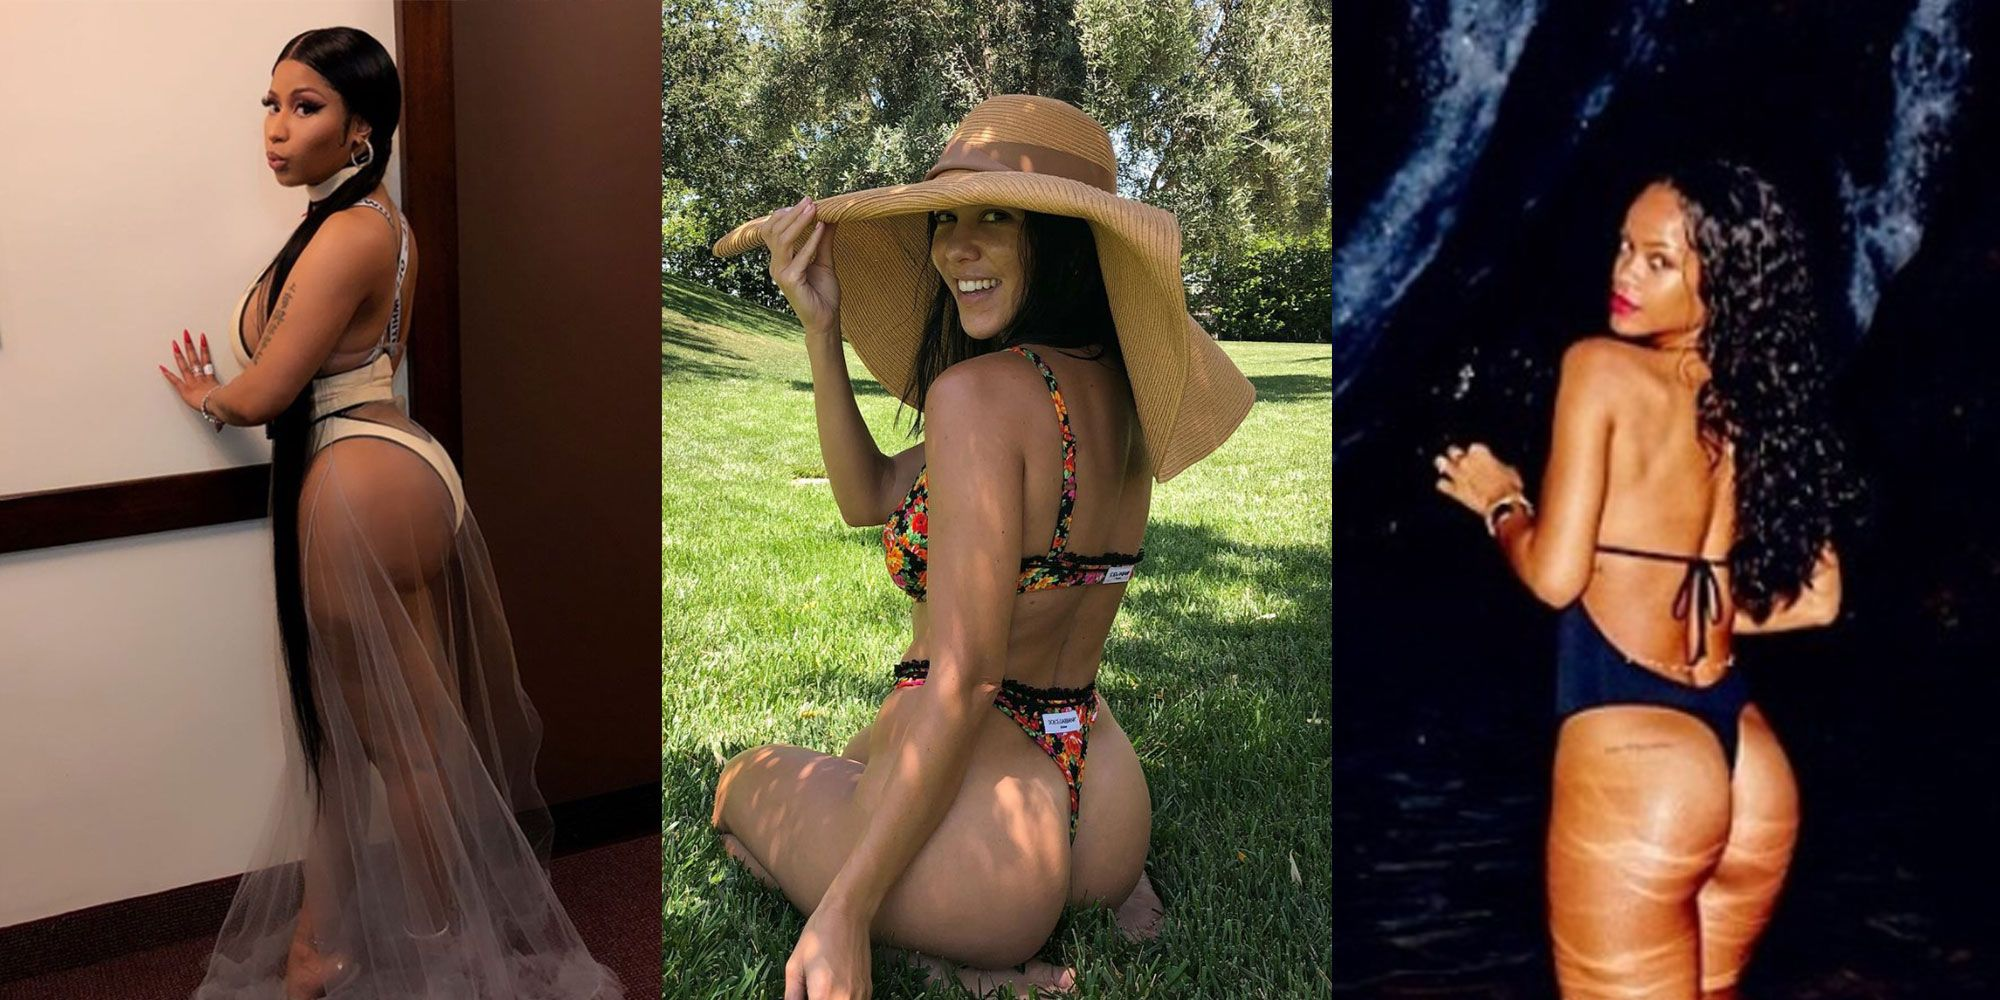 Momoko rima model masturbating mobile porno videos